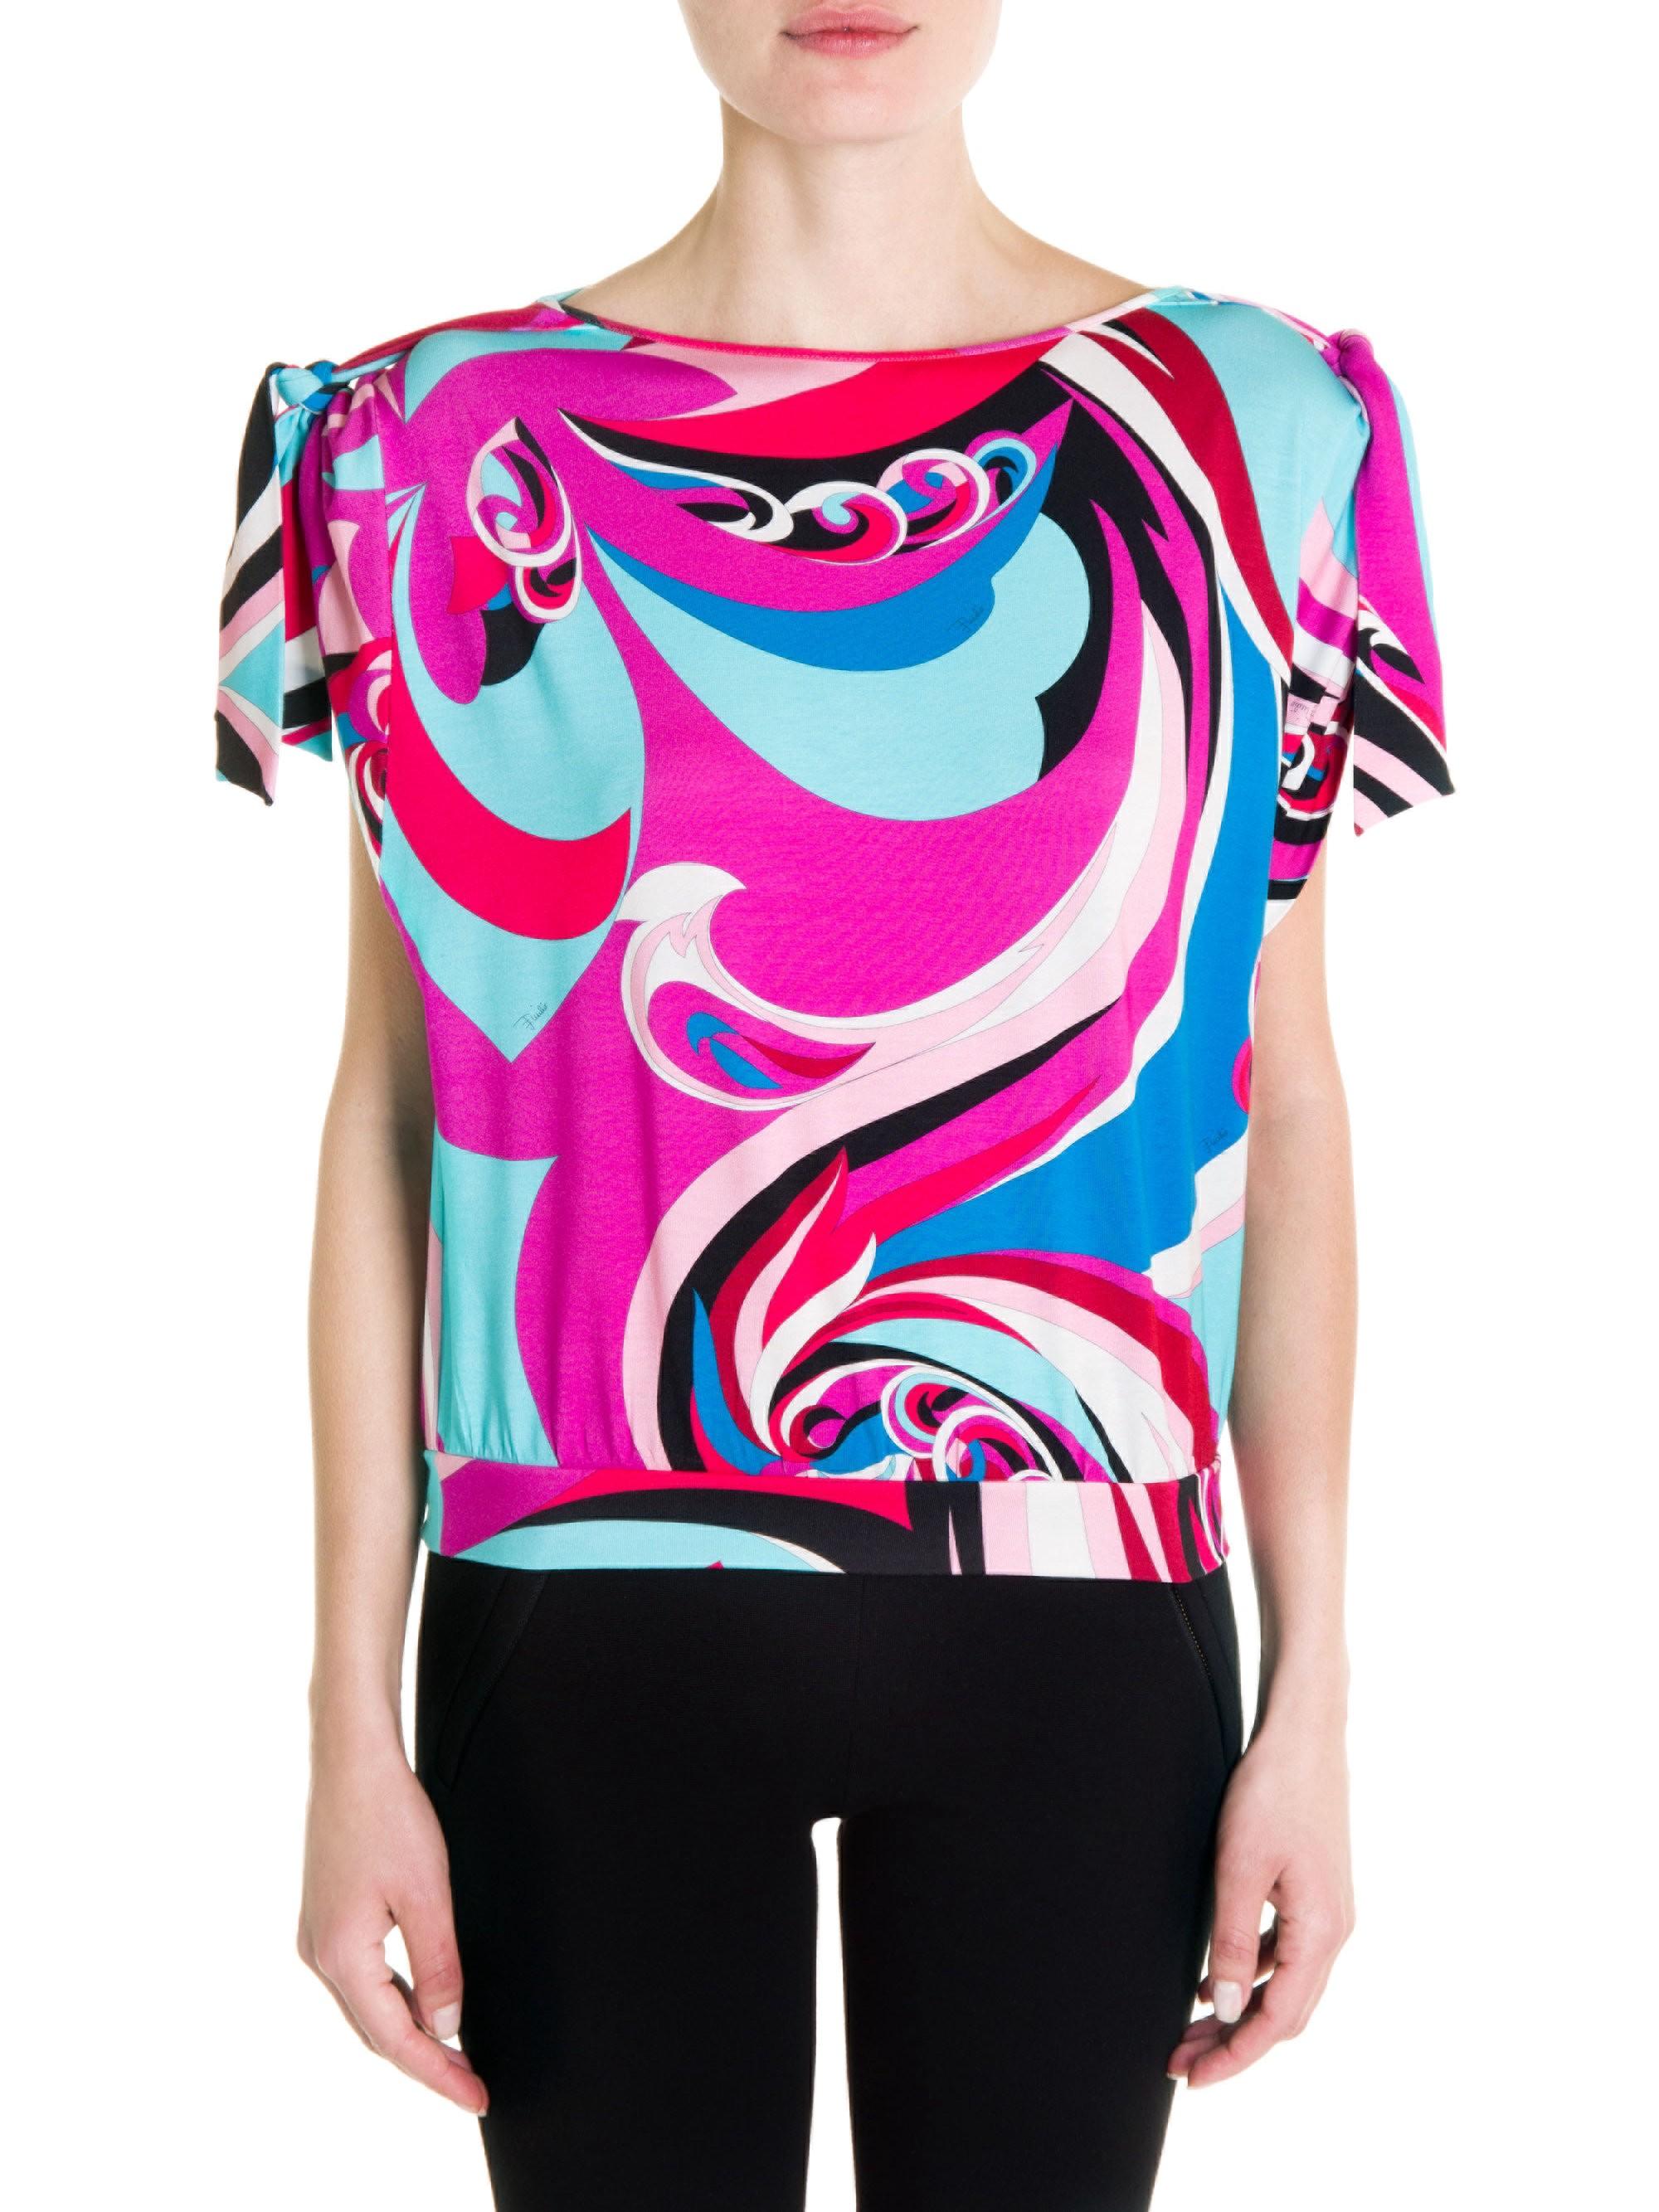 b673aac3a5c5a1 Emilio Pucci Silk Jersey Short-Sleeve Top - Pink Blue Parrot Print 44 (10)